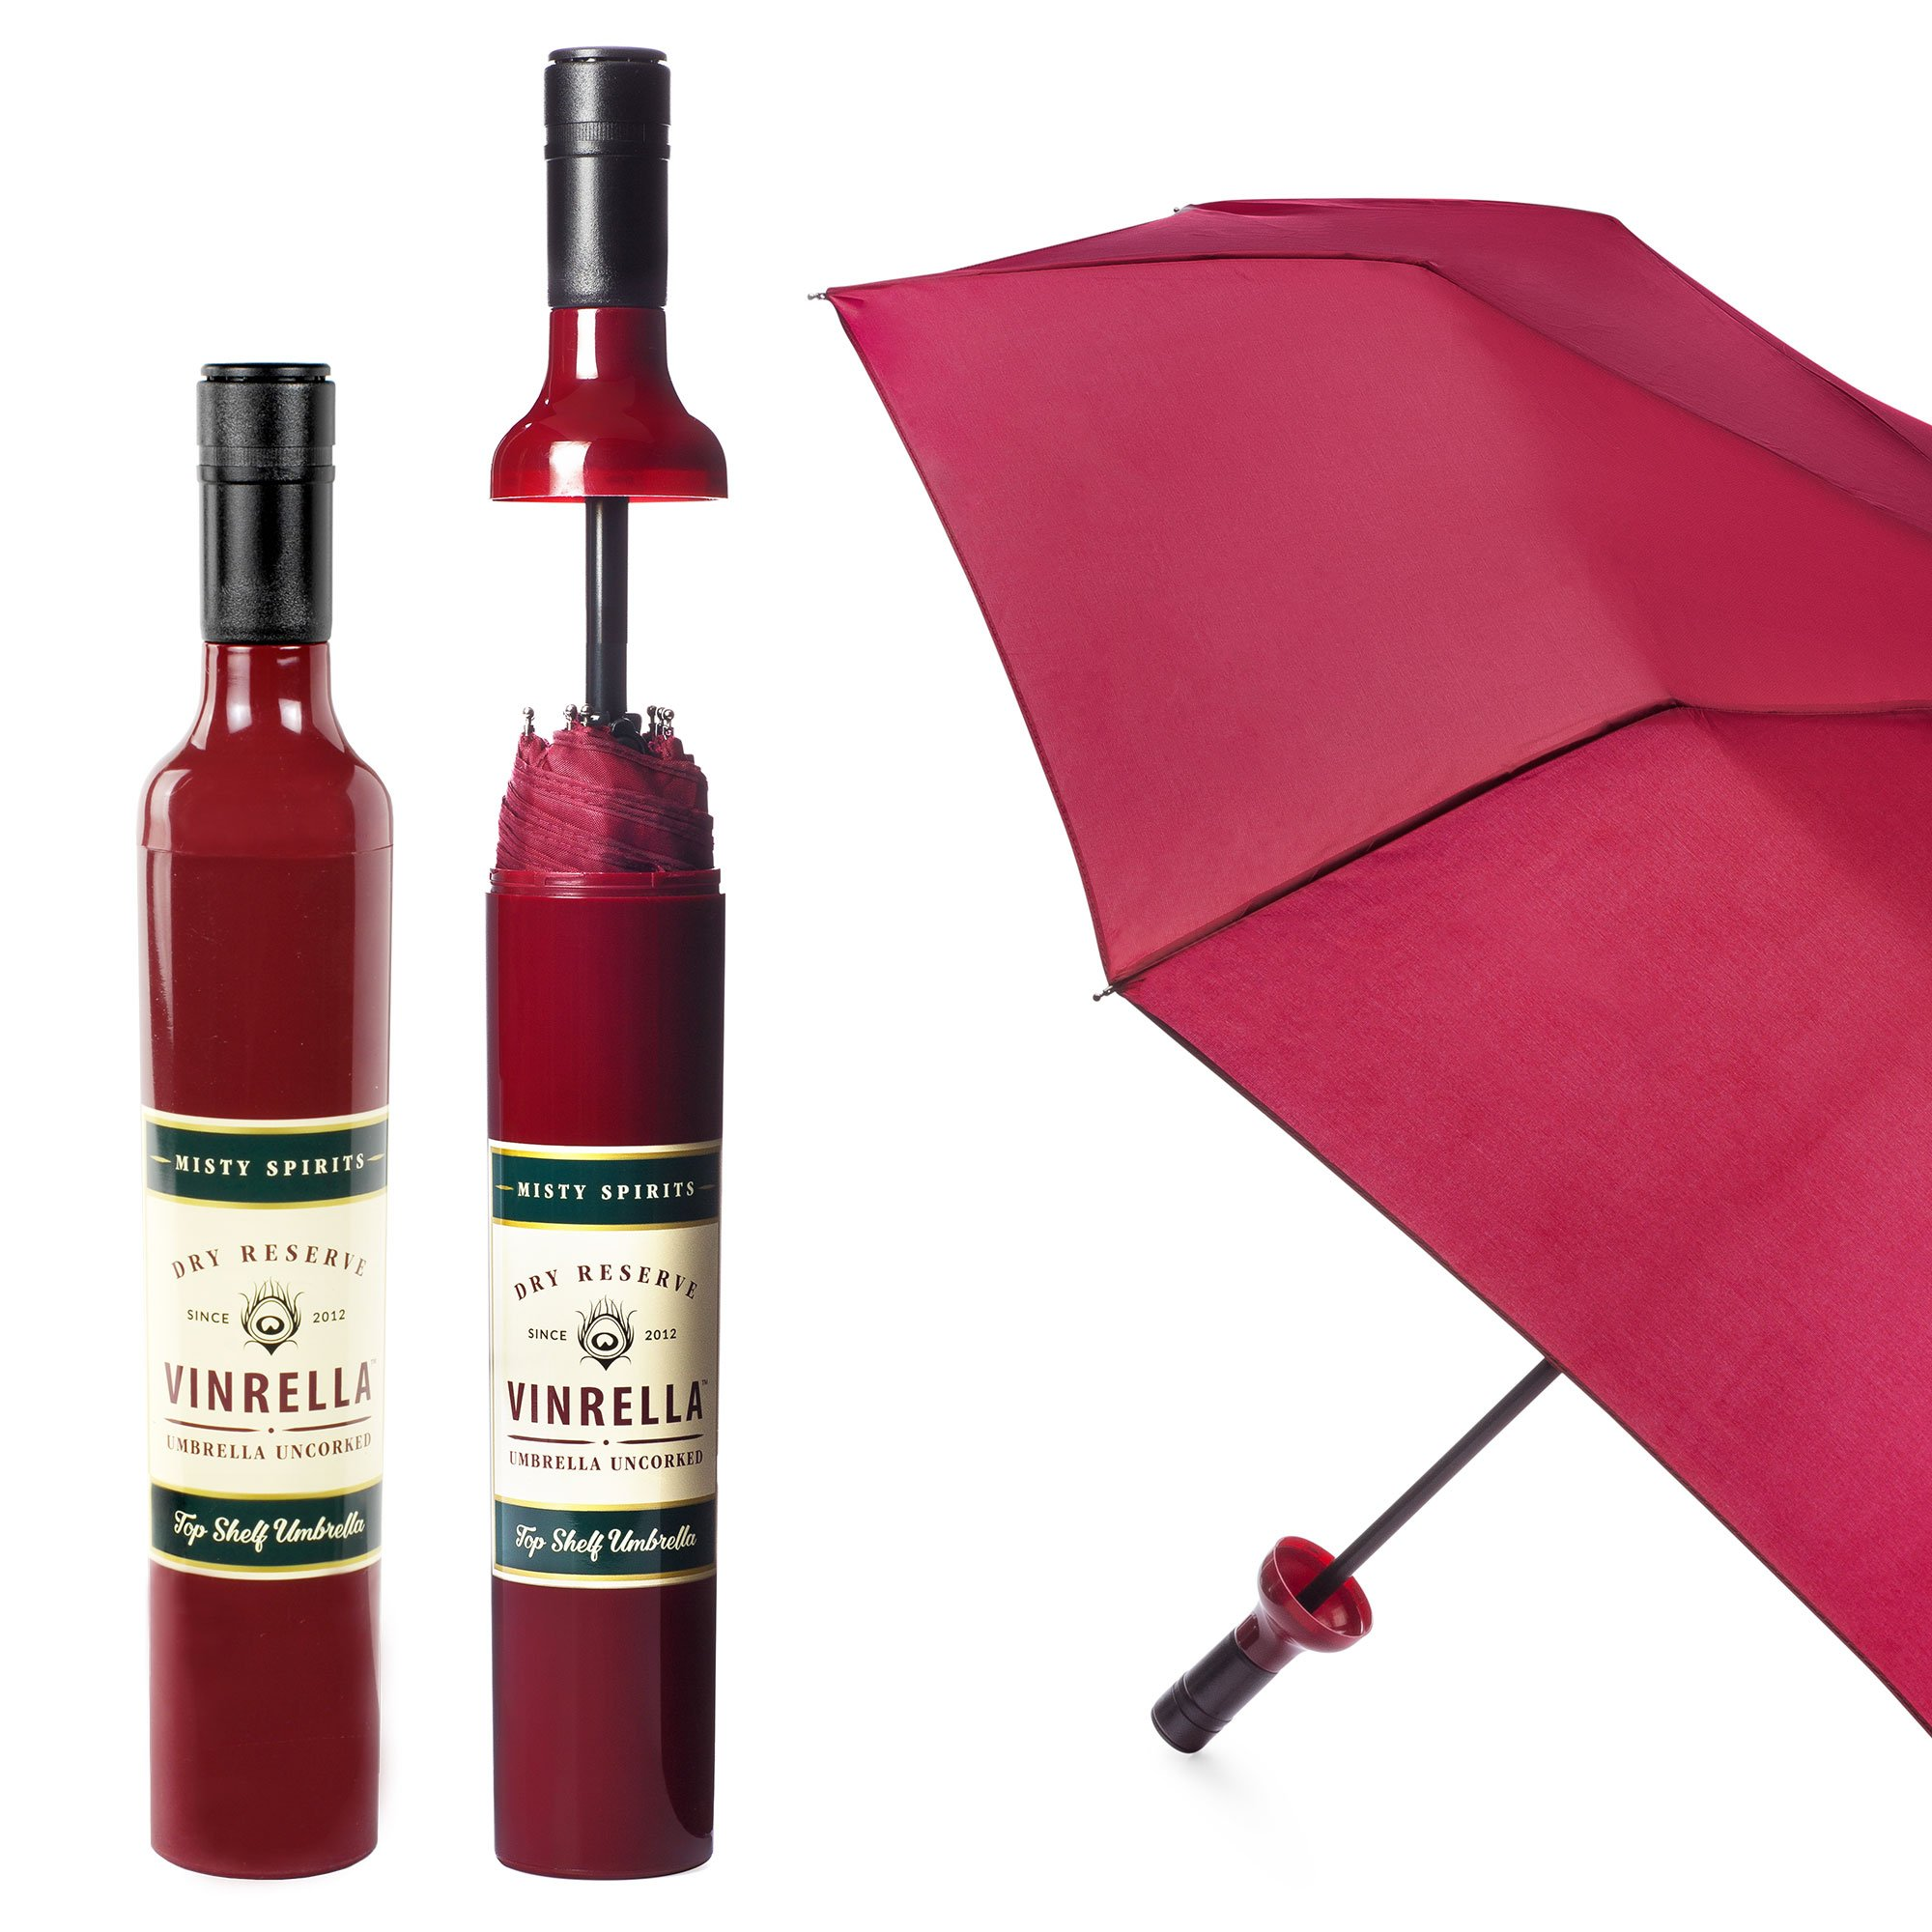 VINRELLA Wine Bottle Umbrellas, Reserve Burgundy